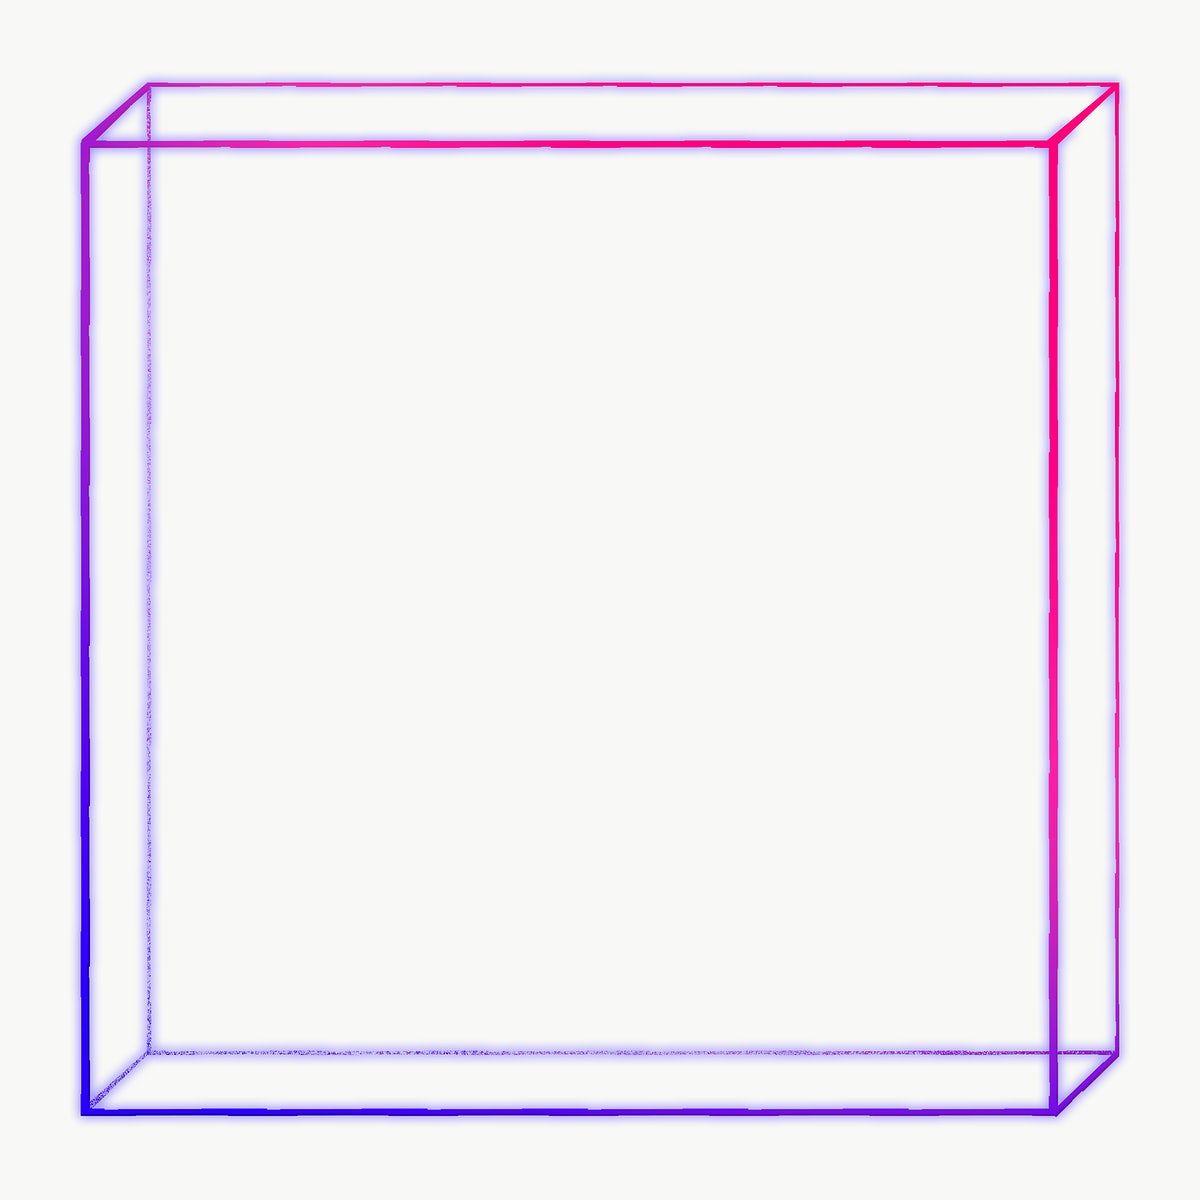 3d Flat Cuboid Outline In Neon Purple Design Element Free Image By Rawpixel Com Sasi Purple Design Design Element Neon Purple